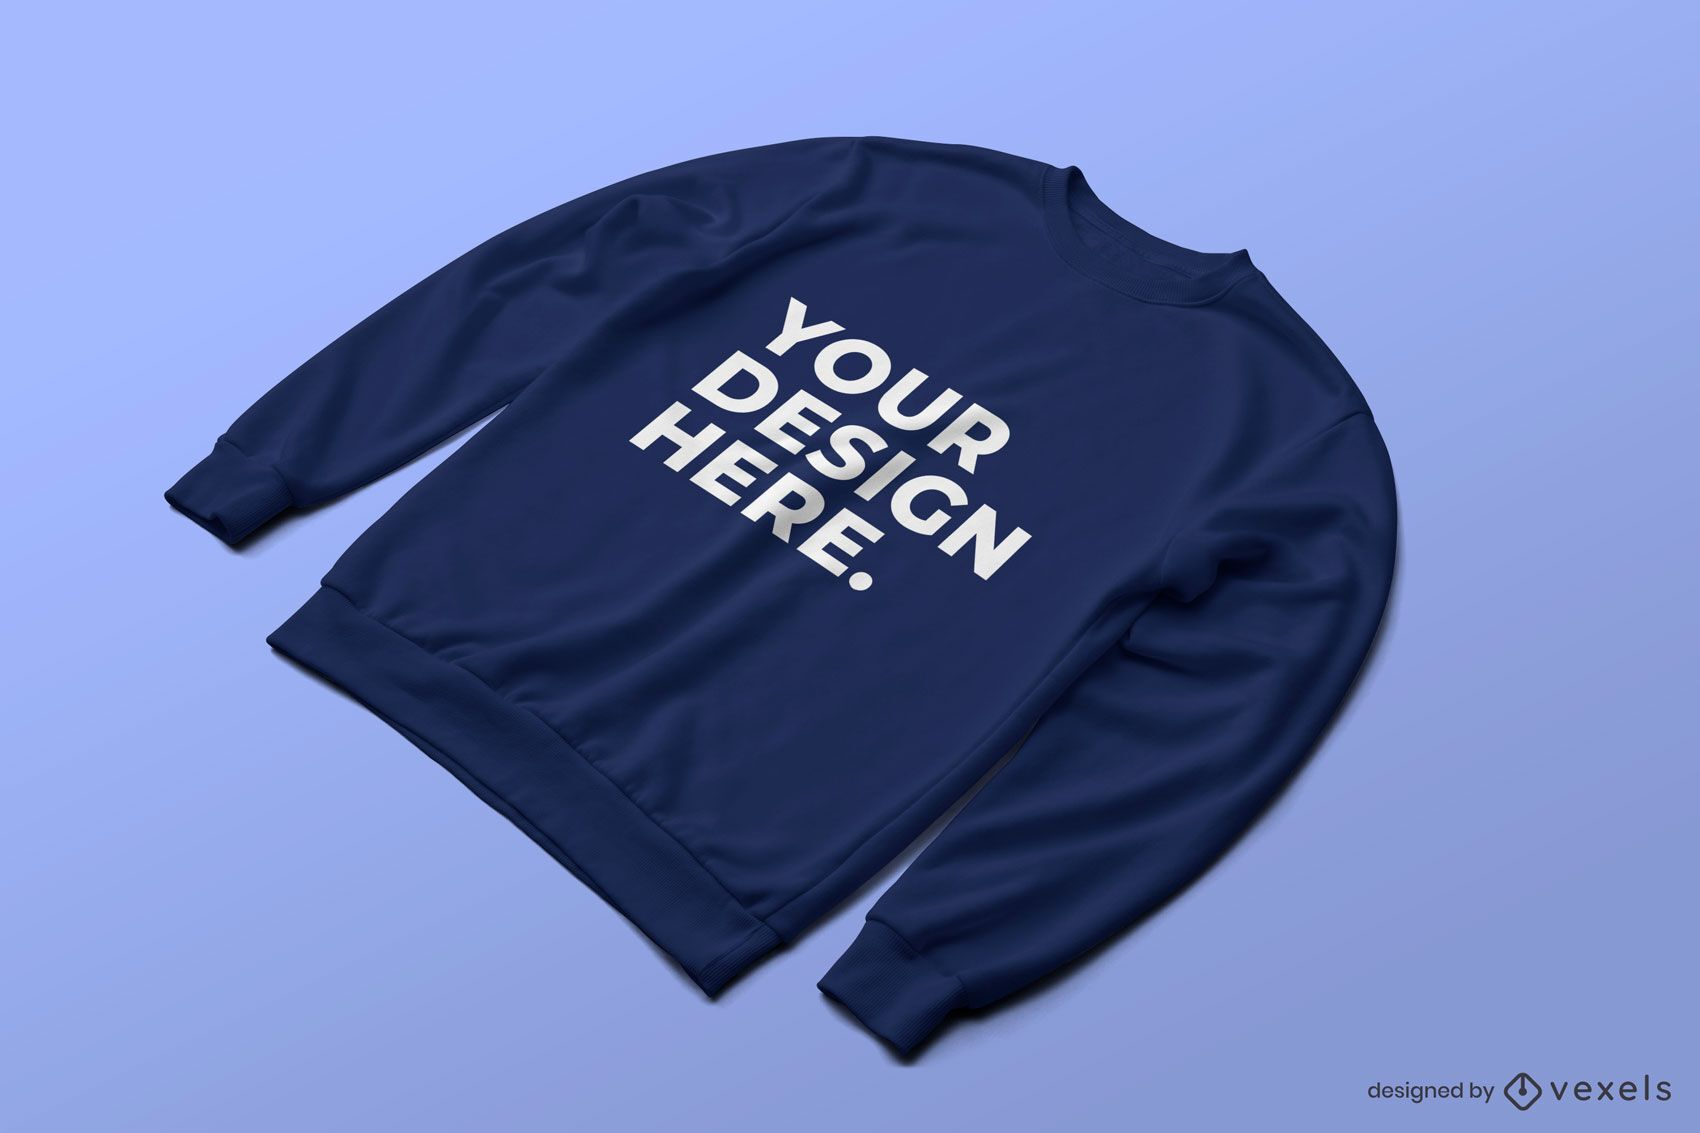 Sweatshirt psd Modell Design